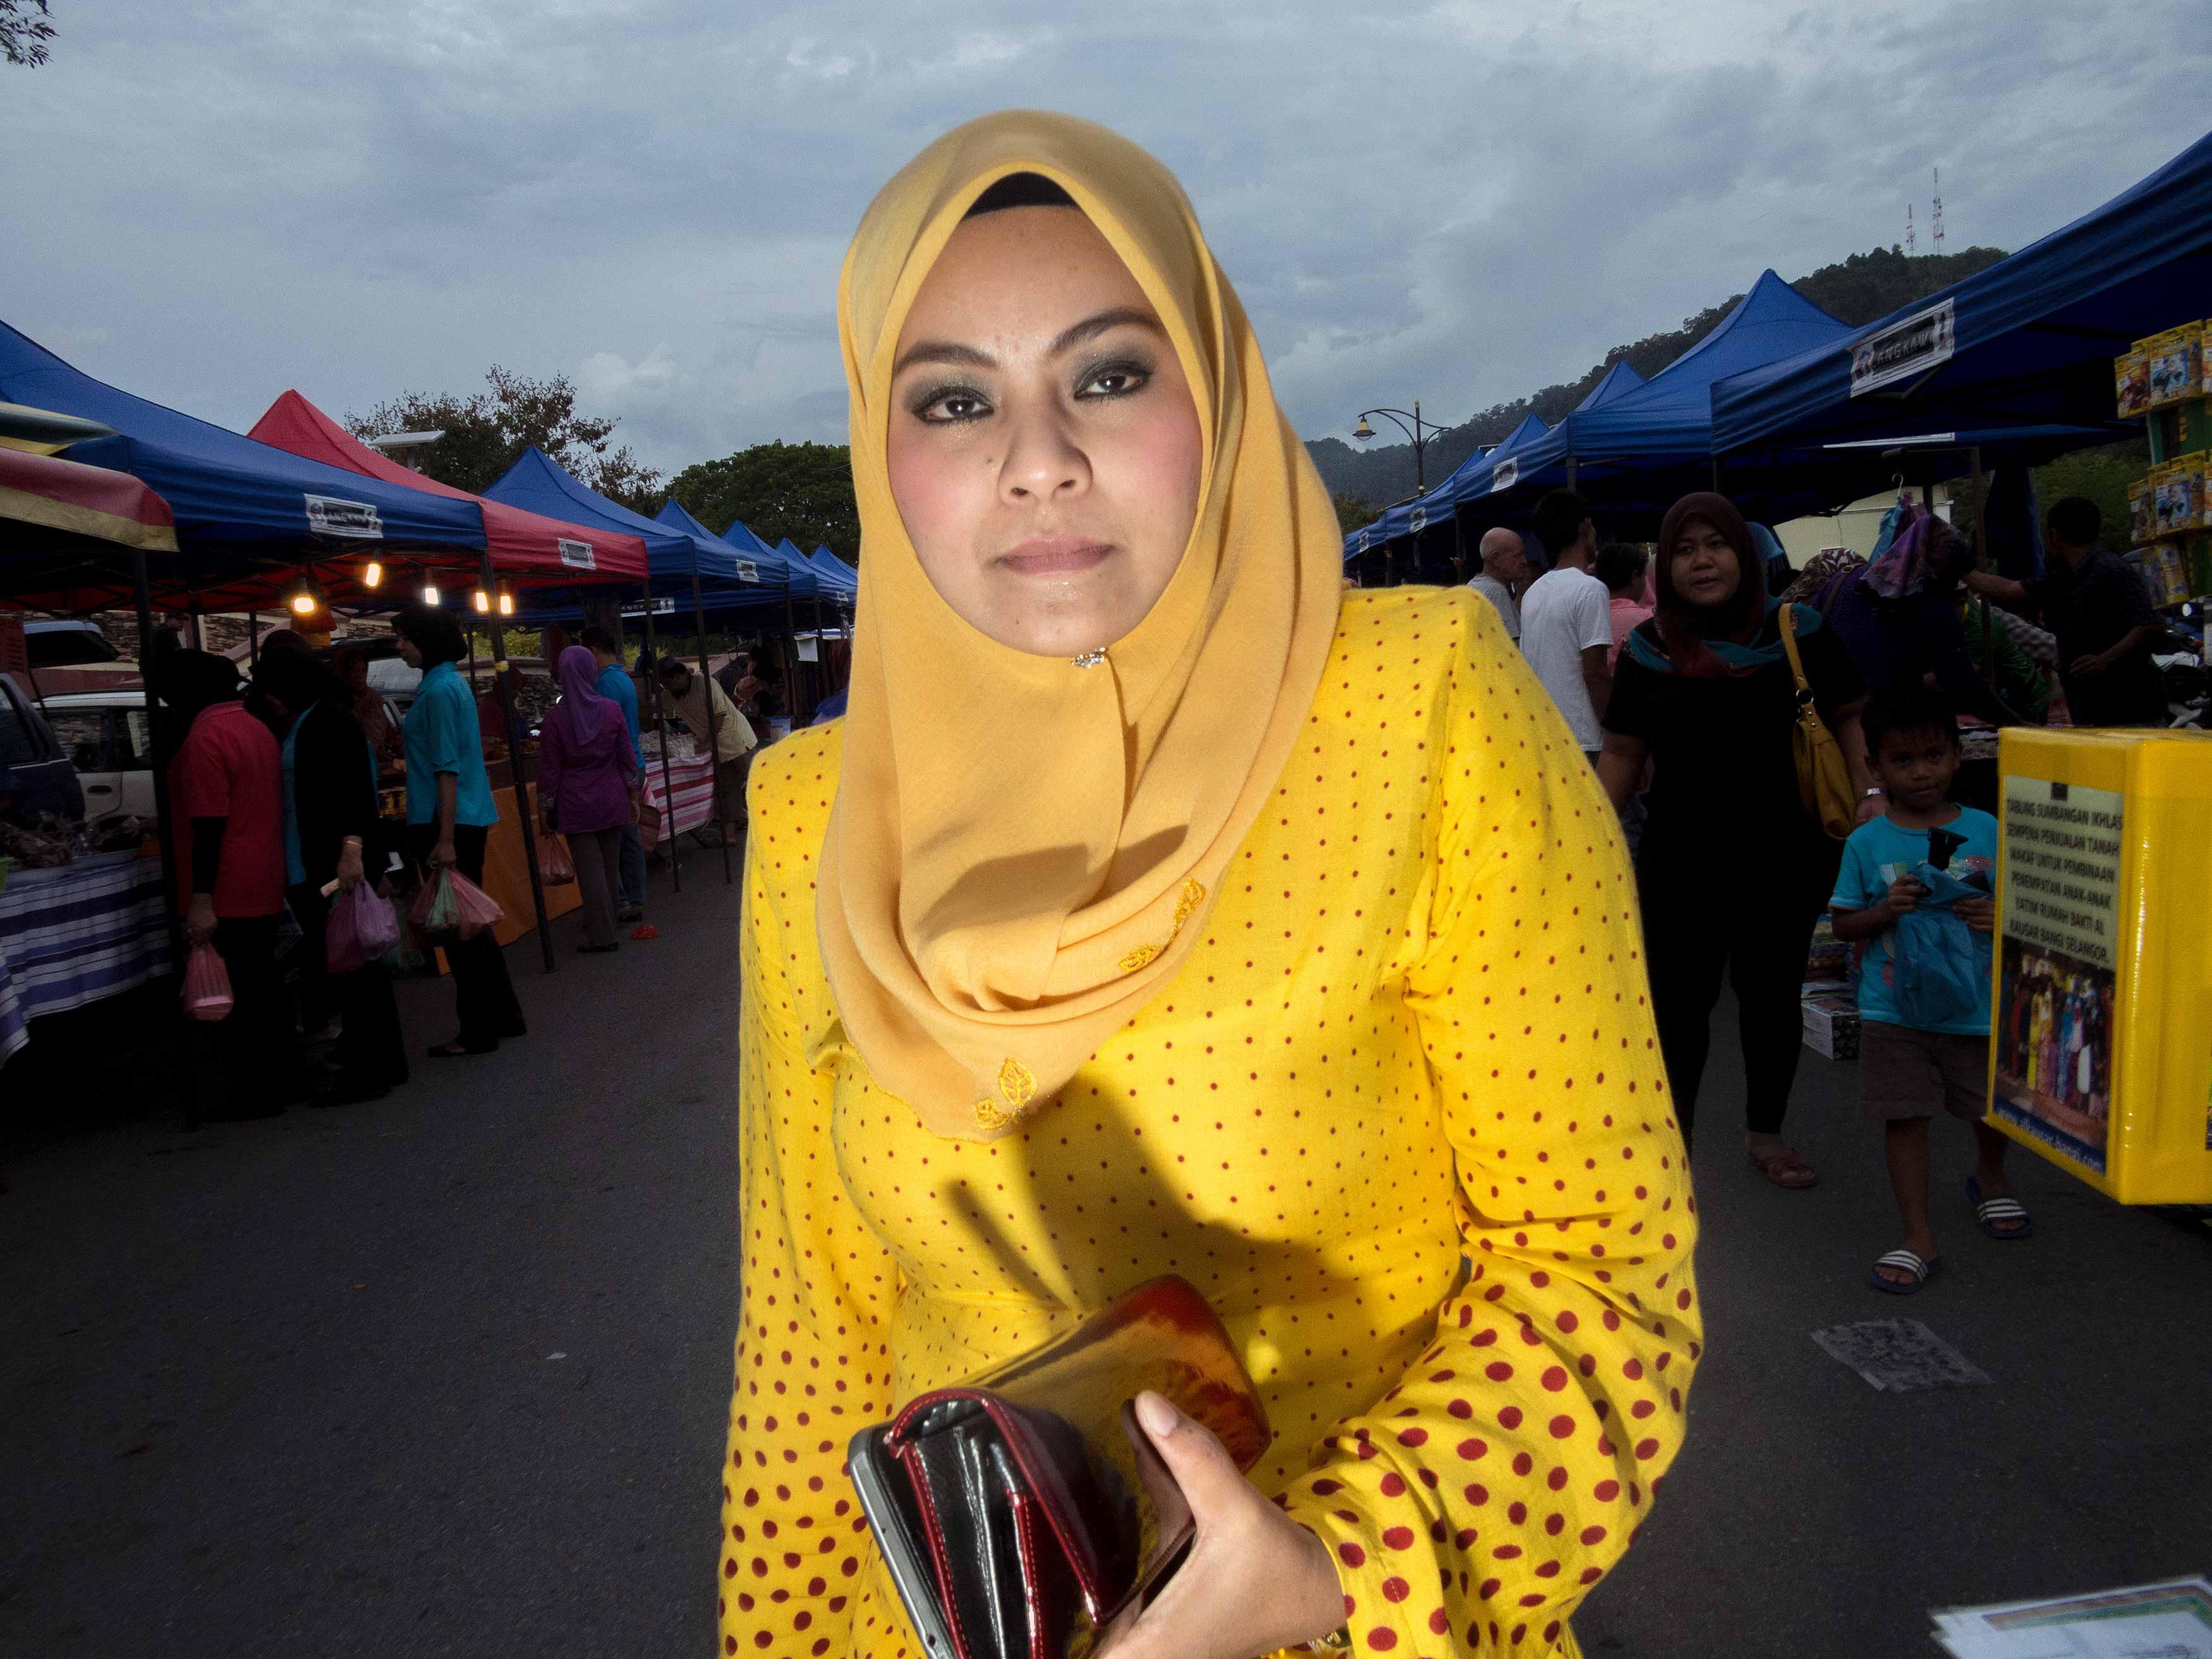 Saturday night market shopping, Langkawi, Malaysia (2013)